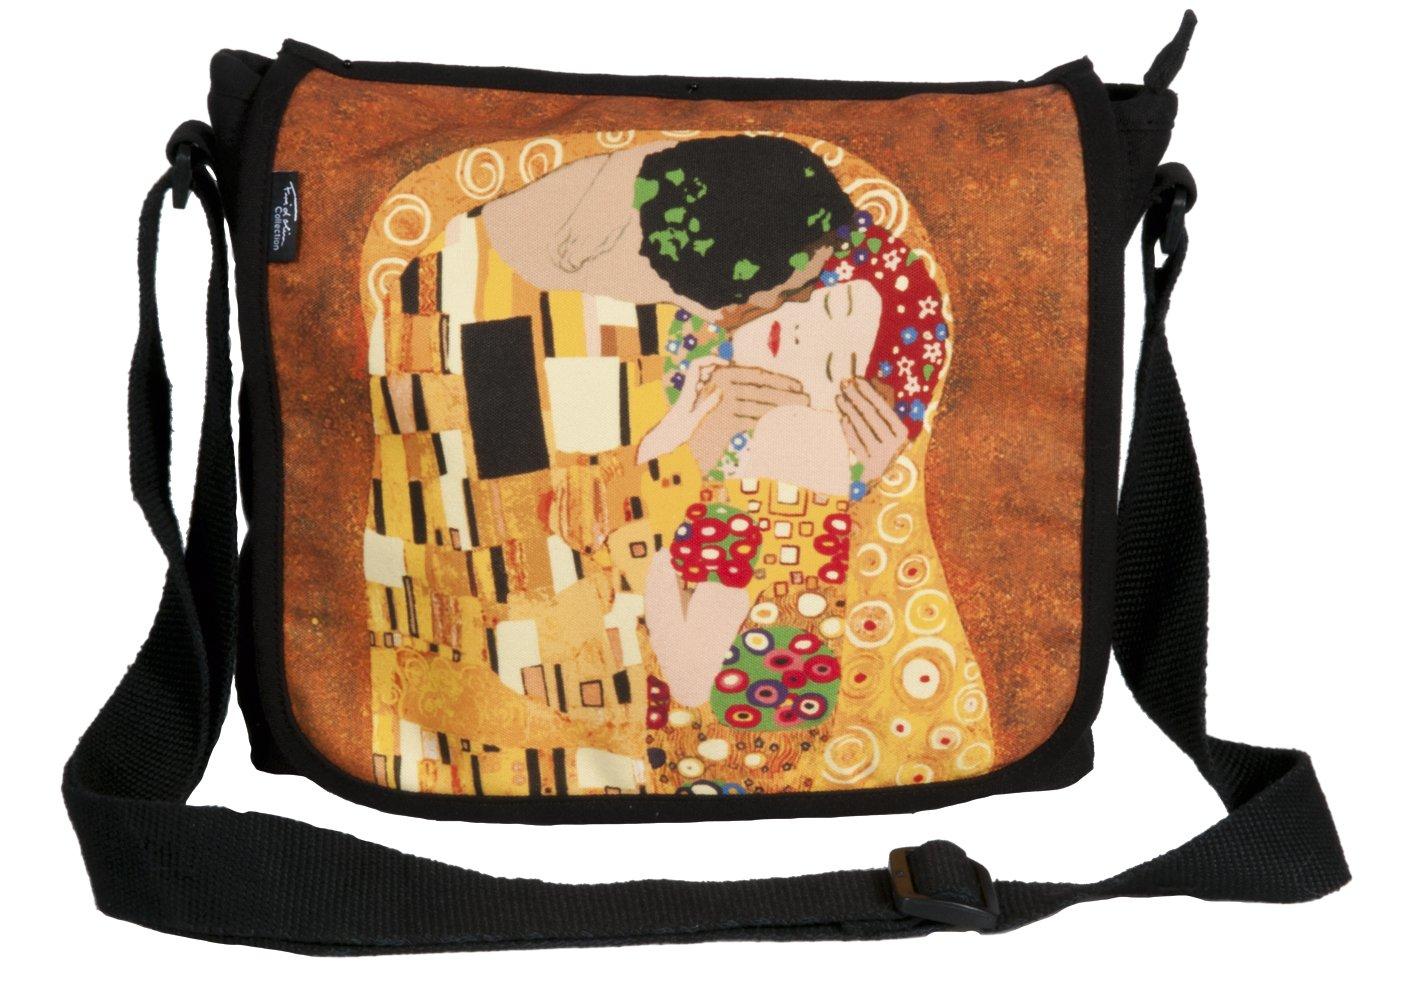 Torba na ramie Gustav Klimt - Der Kuss, Pocalunek